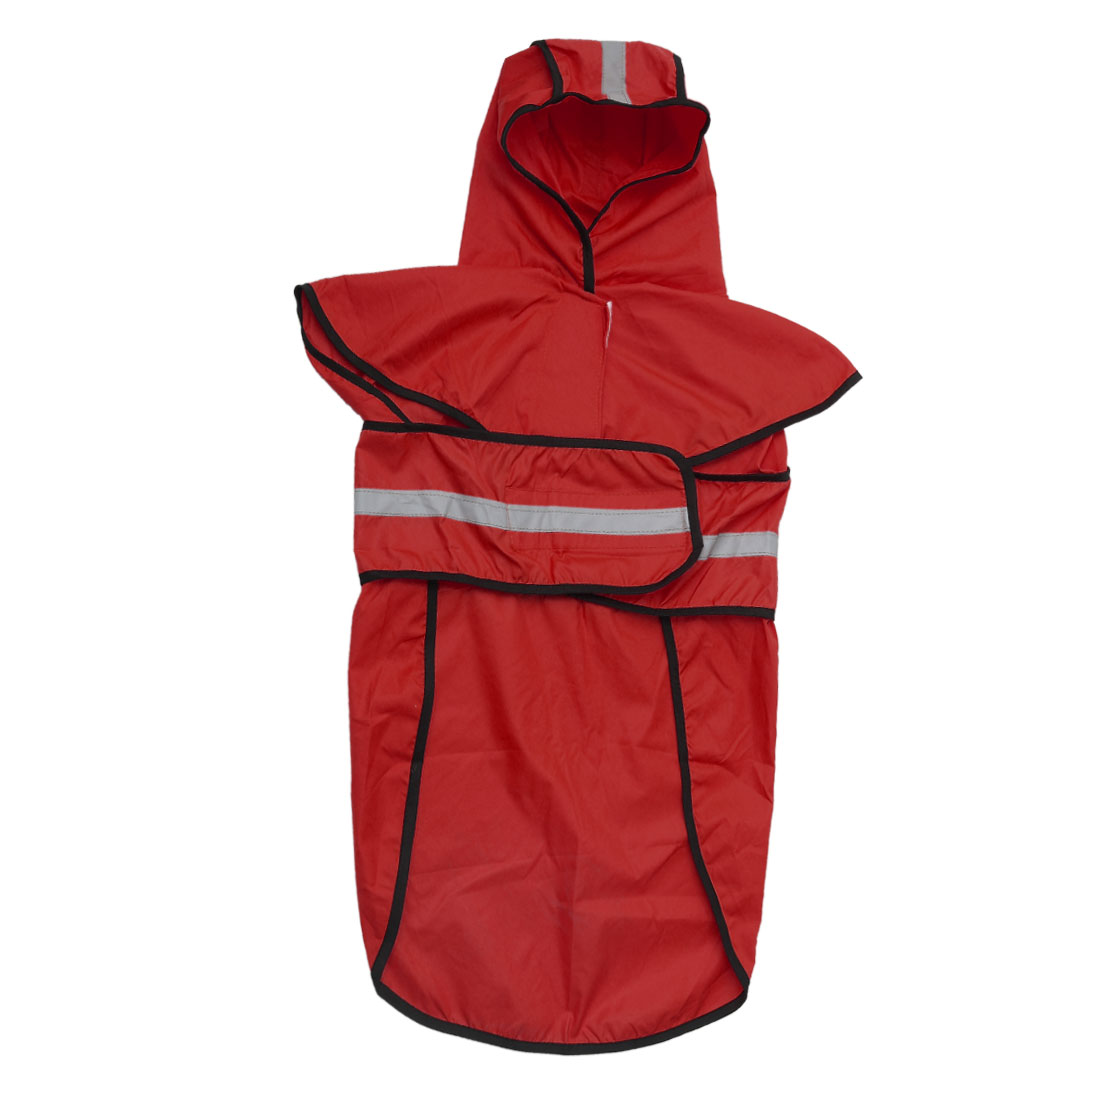 Pet Dogs Raincoat Rain Jacket Poncho Cloth Water-resistant Rainwears Red 4XL